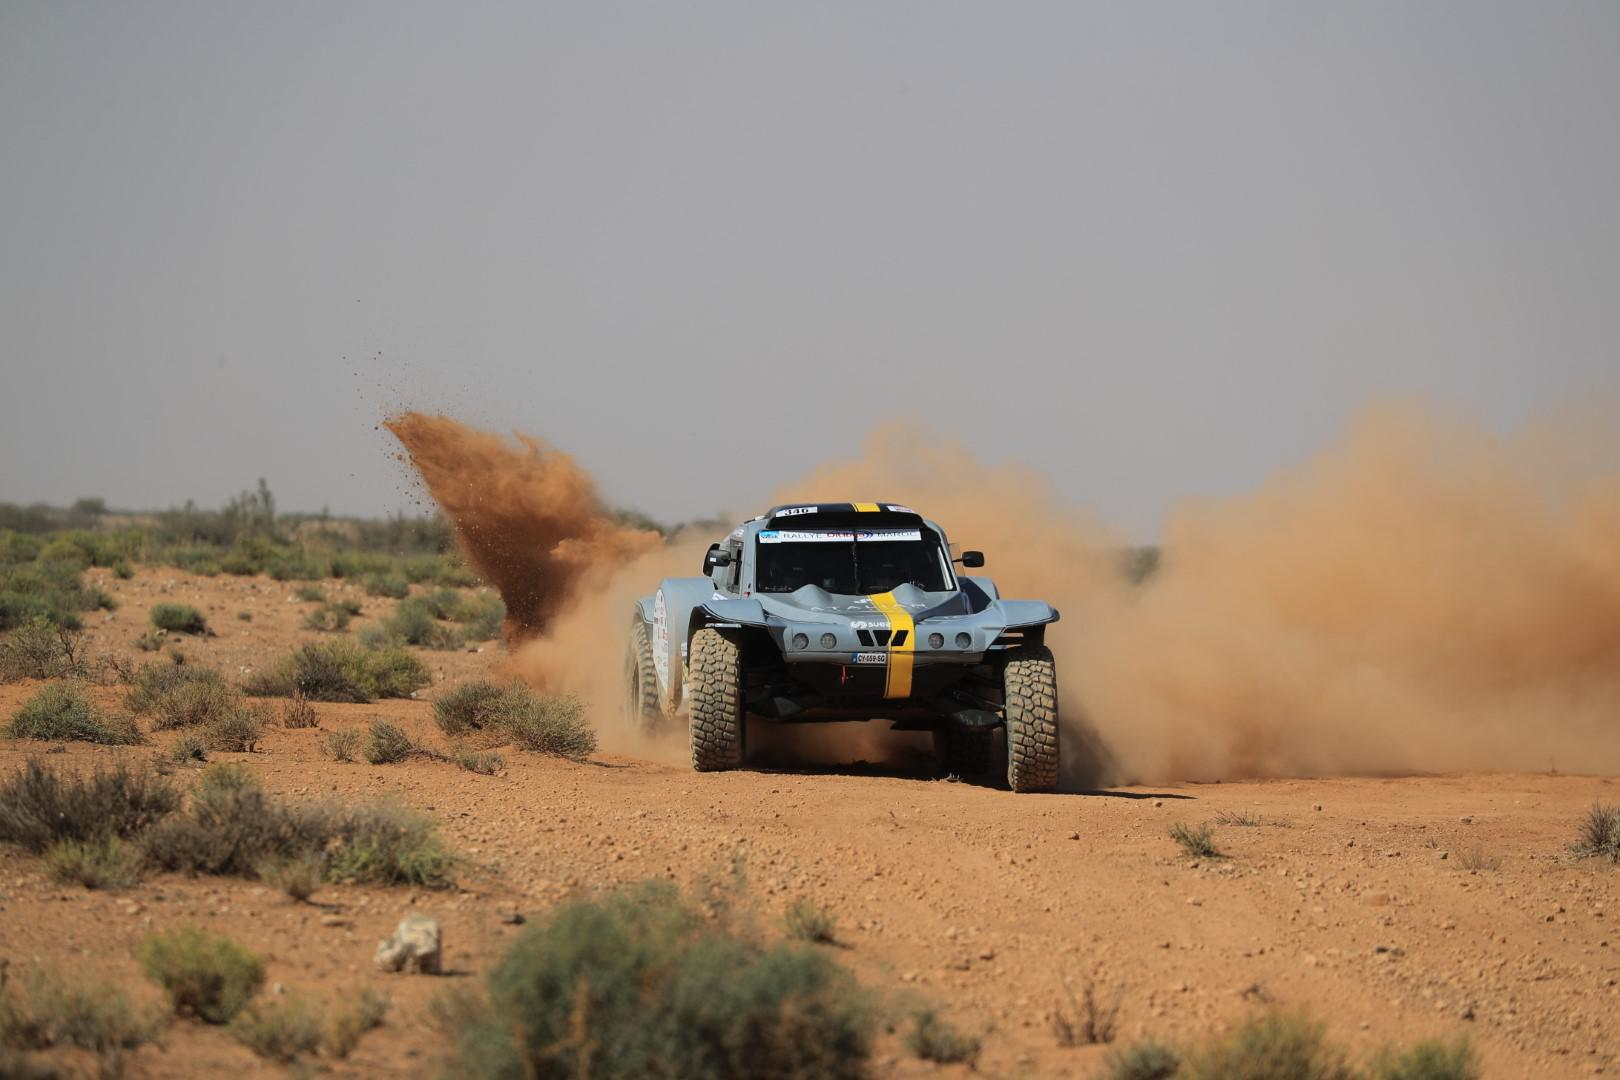 l-equipe-objectif-dunes-de-l-aeronautique-au-desert-878-1.jpg